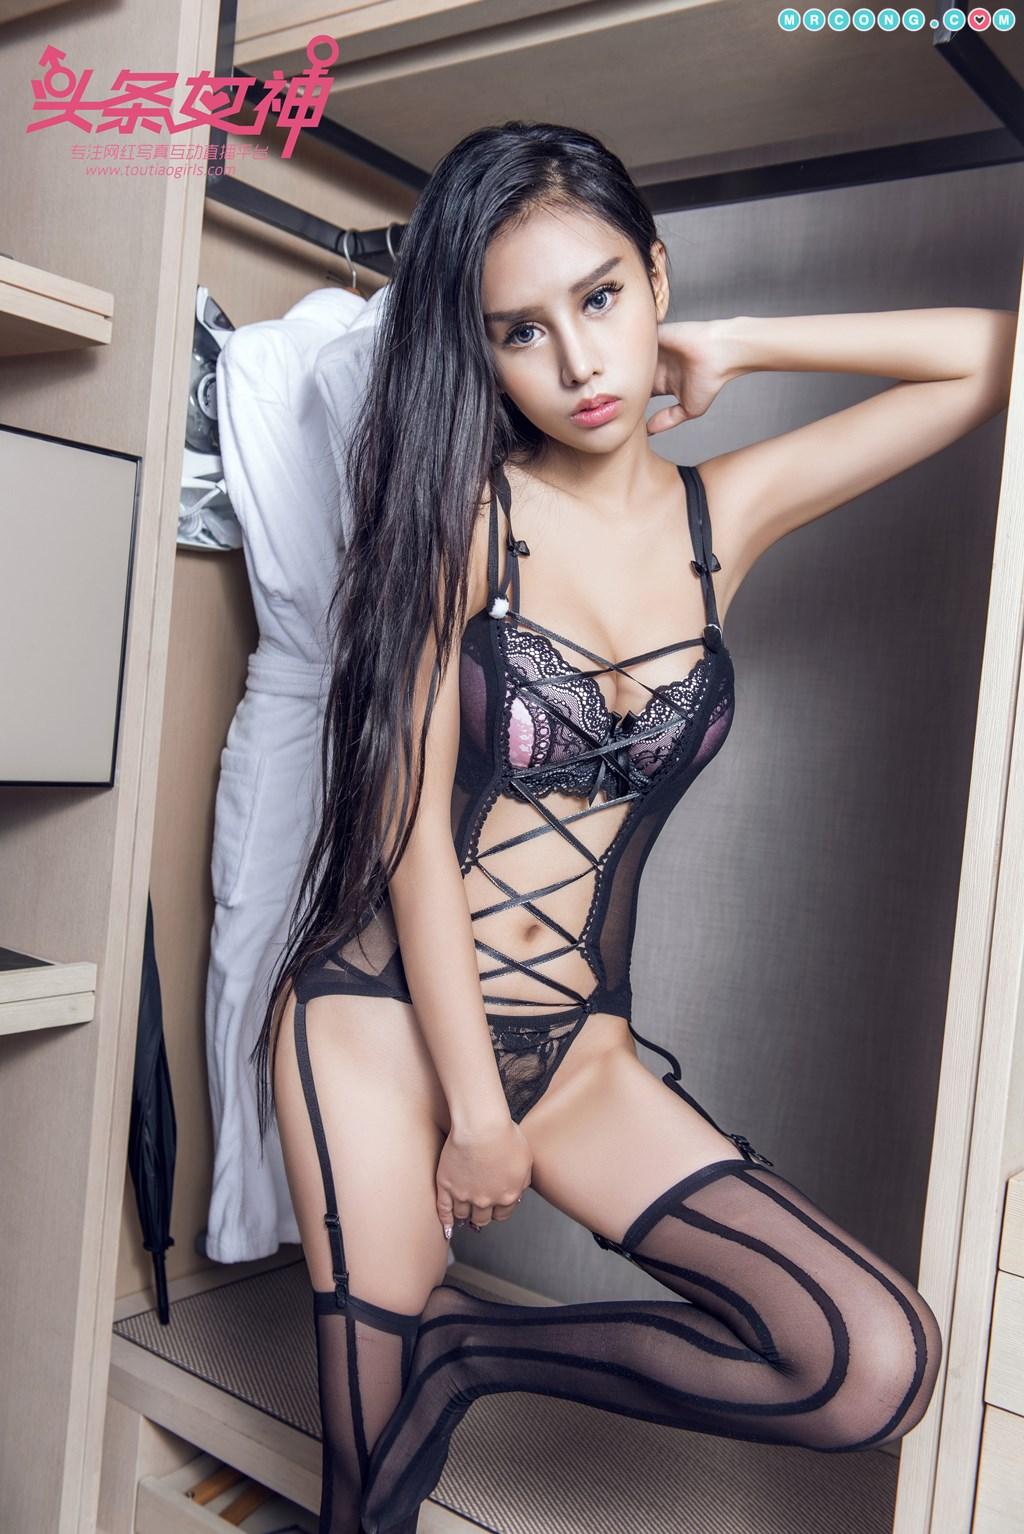 Image TouTiao-2017-12-05-Chen-Di-Ya-MrCong.com-018 in post TouTiao 2017-12-05: Người mẫu Chen Di Ya (陈迪垭) (35 ảnh)